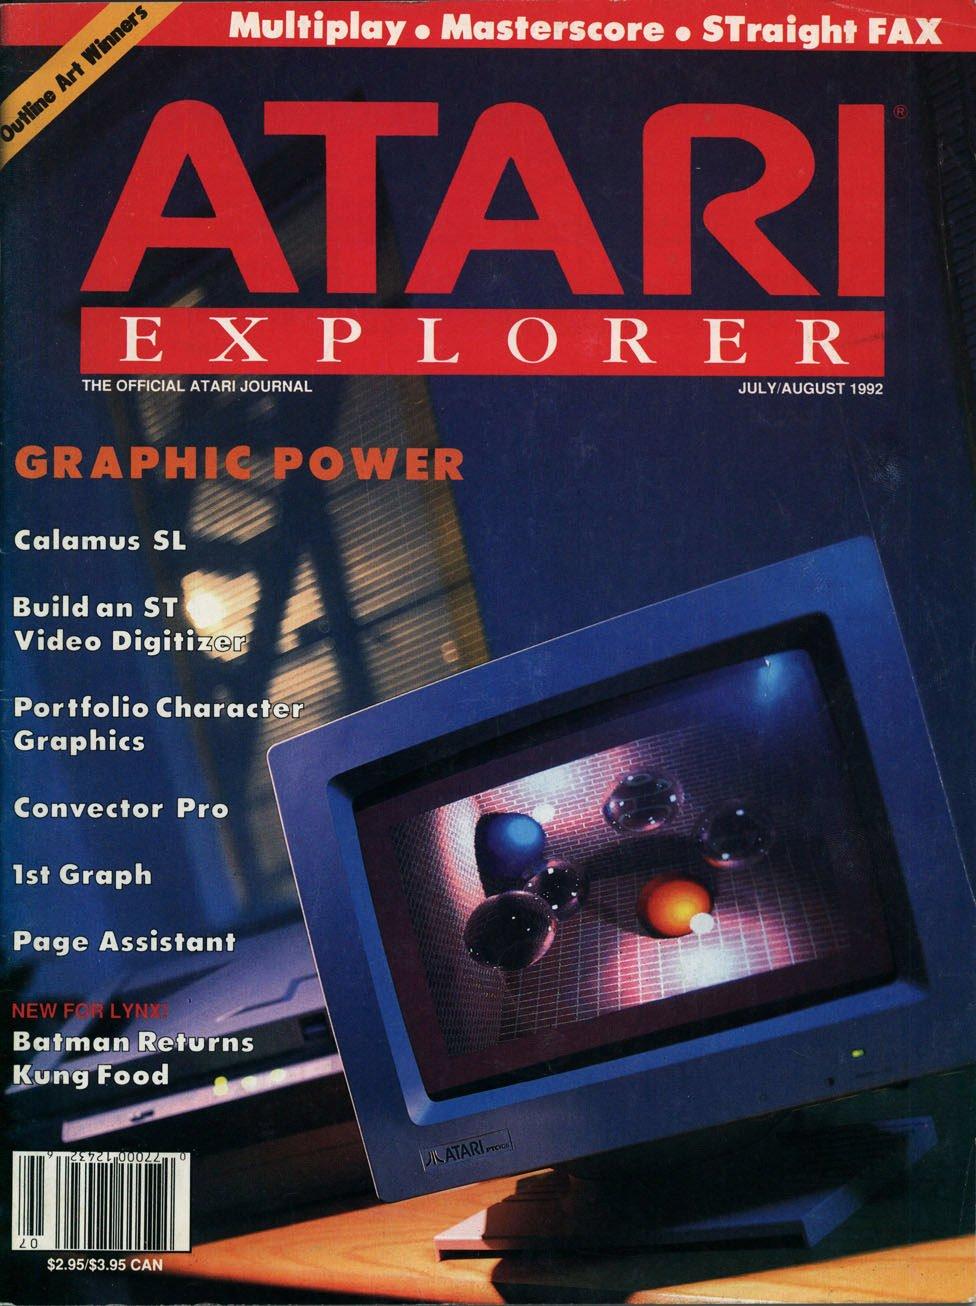 Atari Explorer Issue 34 (July / August 1992)